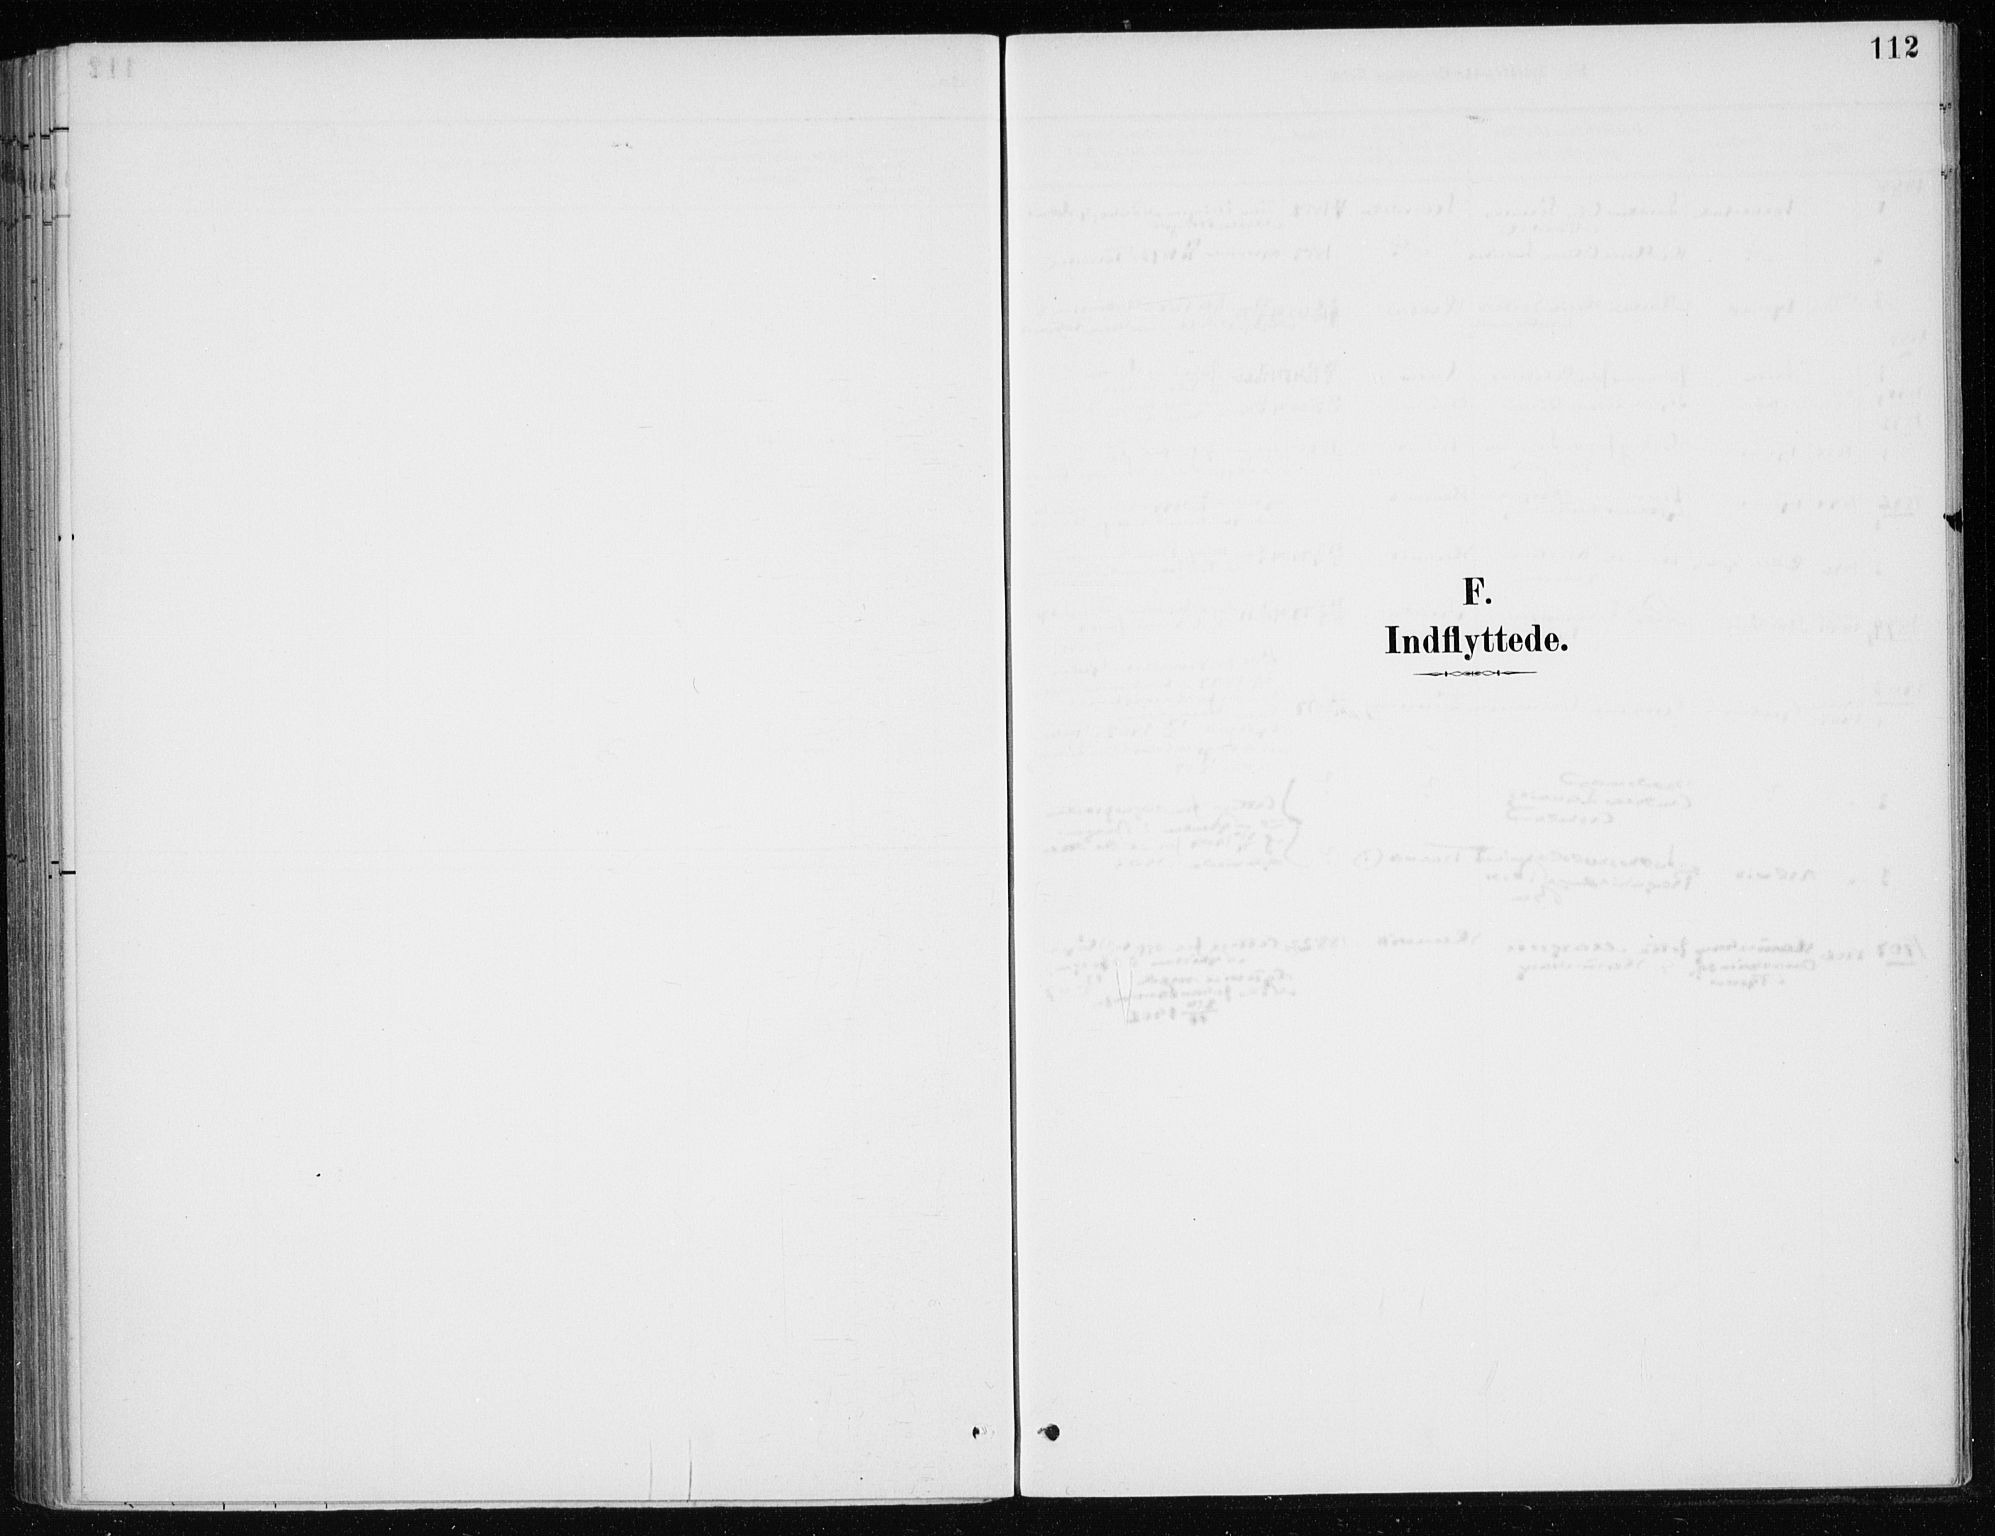 SAB, Kvinnherad Sokneprestembete, H/Haa: Parish register (official) no. E 1, 1887-1912, p. 112